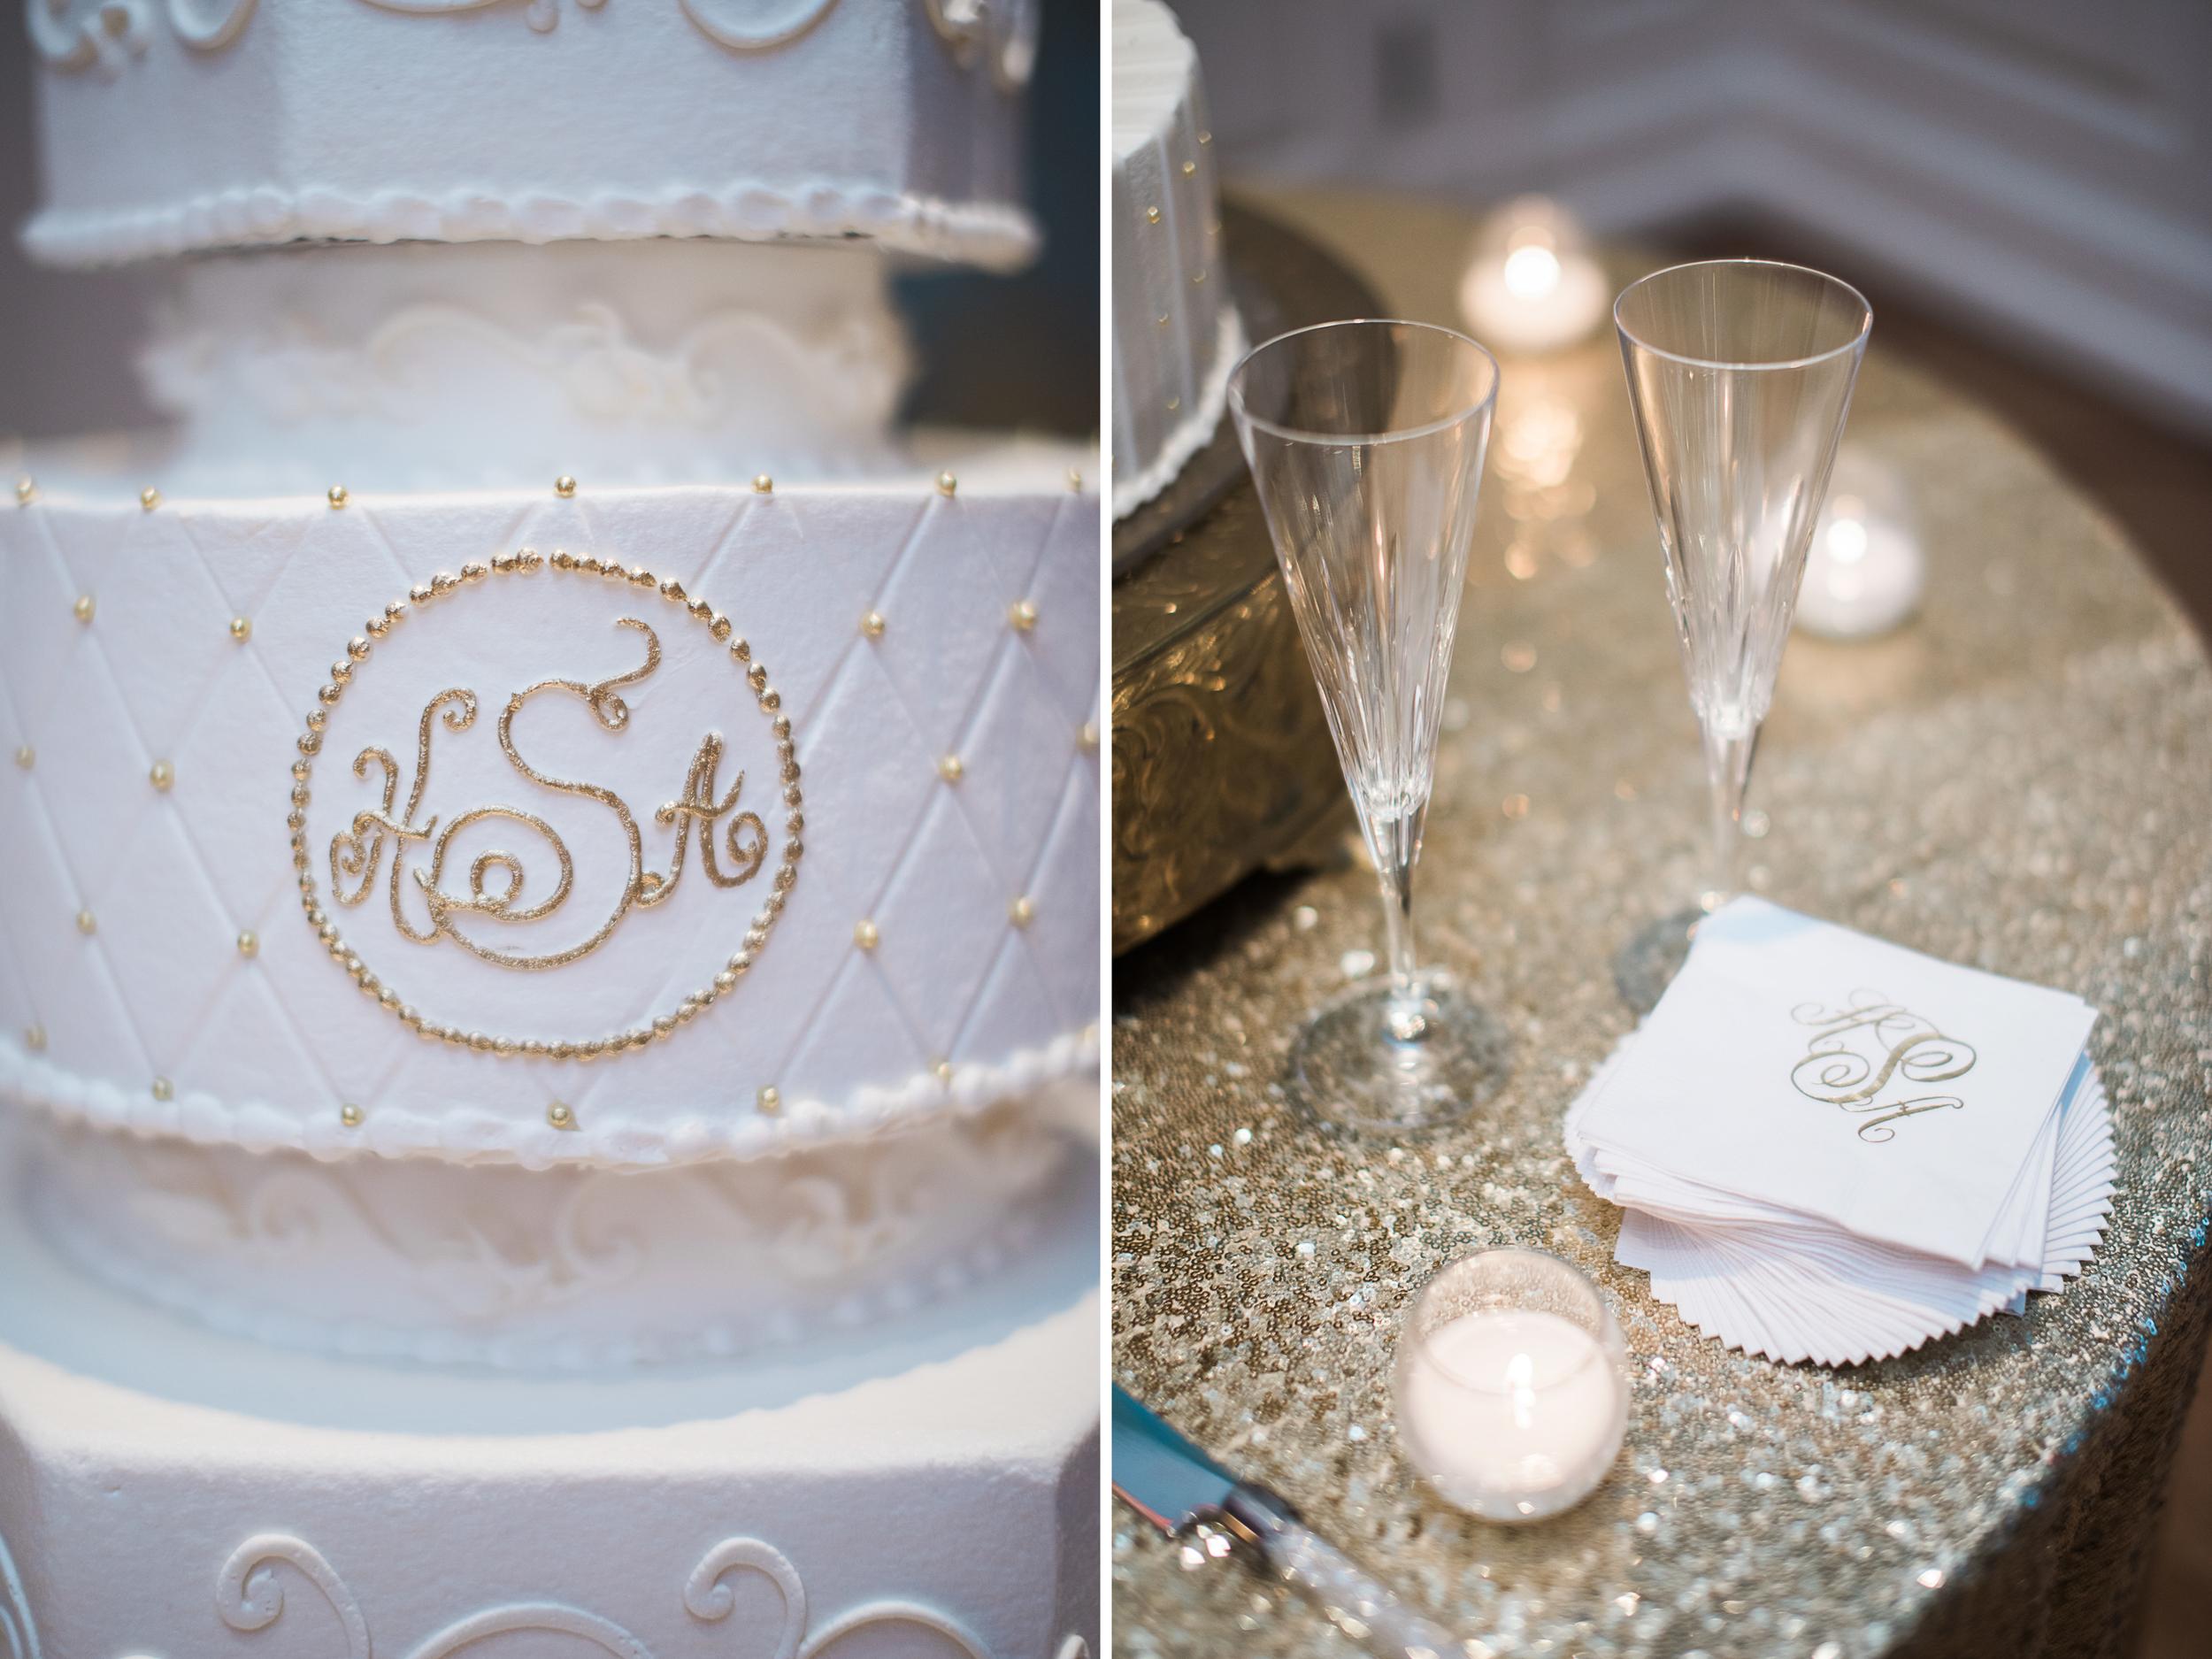 Dana-Fernandez-Photography-Weddings-in-Houston-Magazine-feature-Houston-wedding-photographer-film-189.jpg